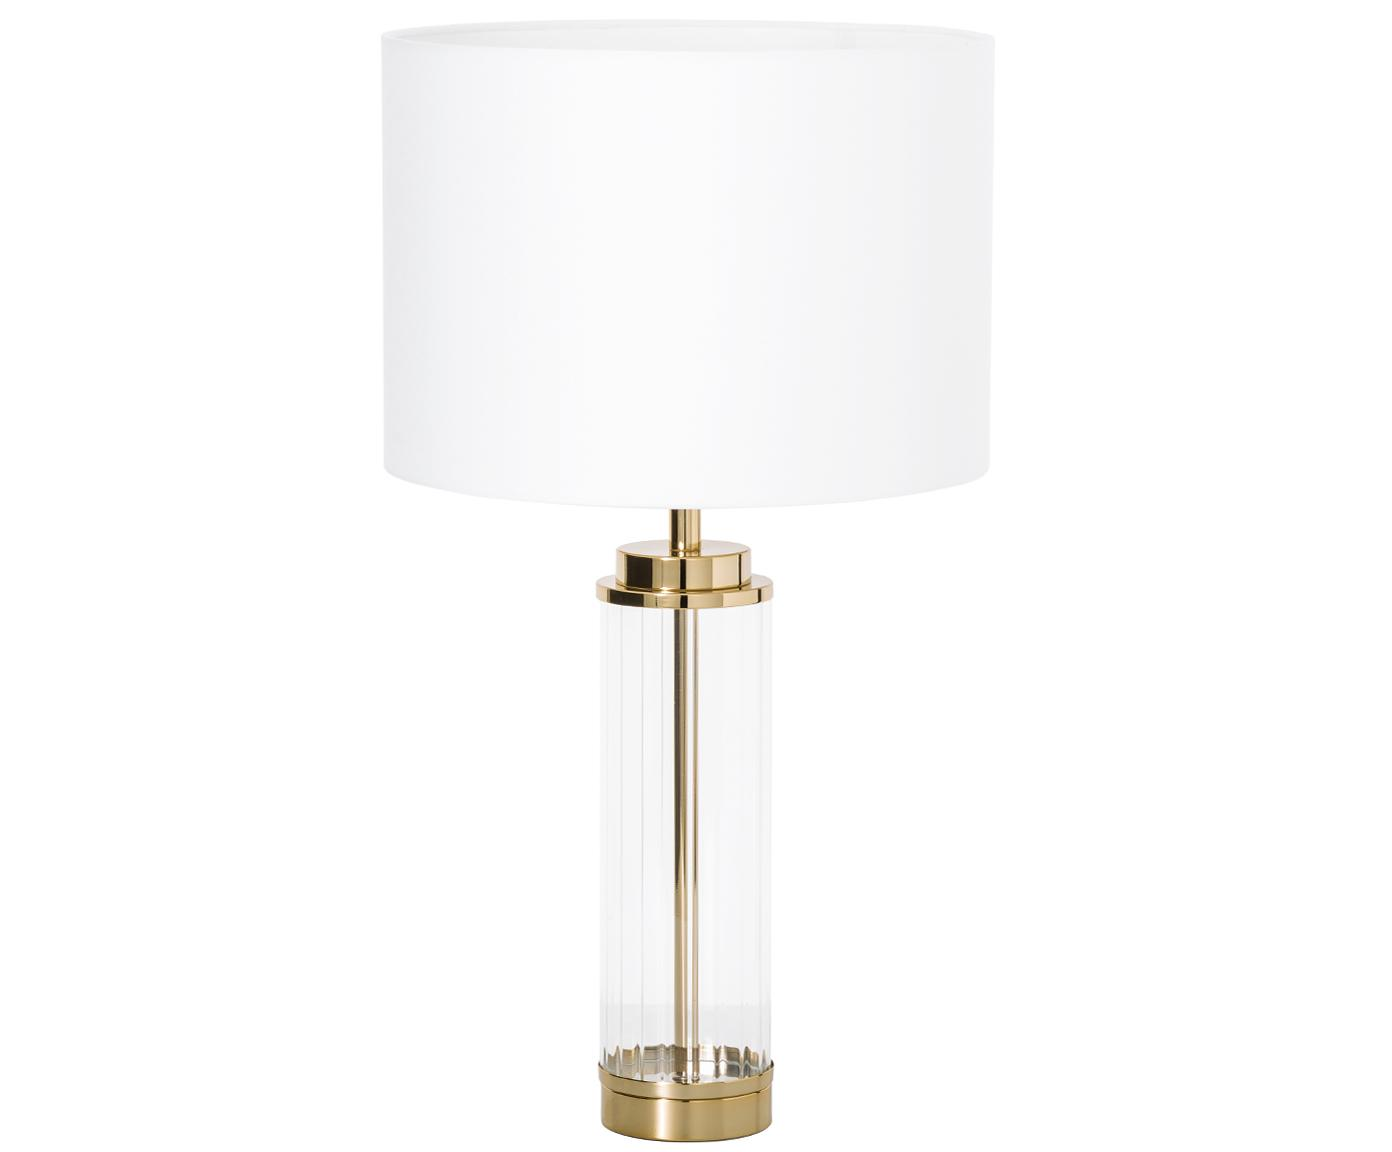 Lámpara de mesa Gabor, estilo clásico, Pantalla: tela, Crema, dorado, Ø 35 x Al 64 cm